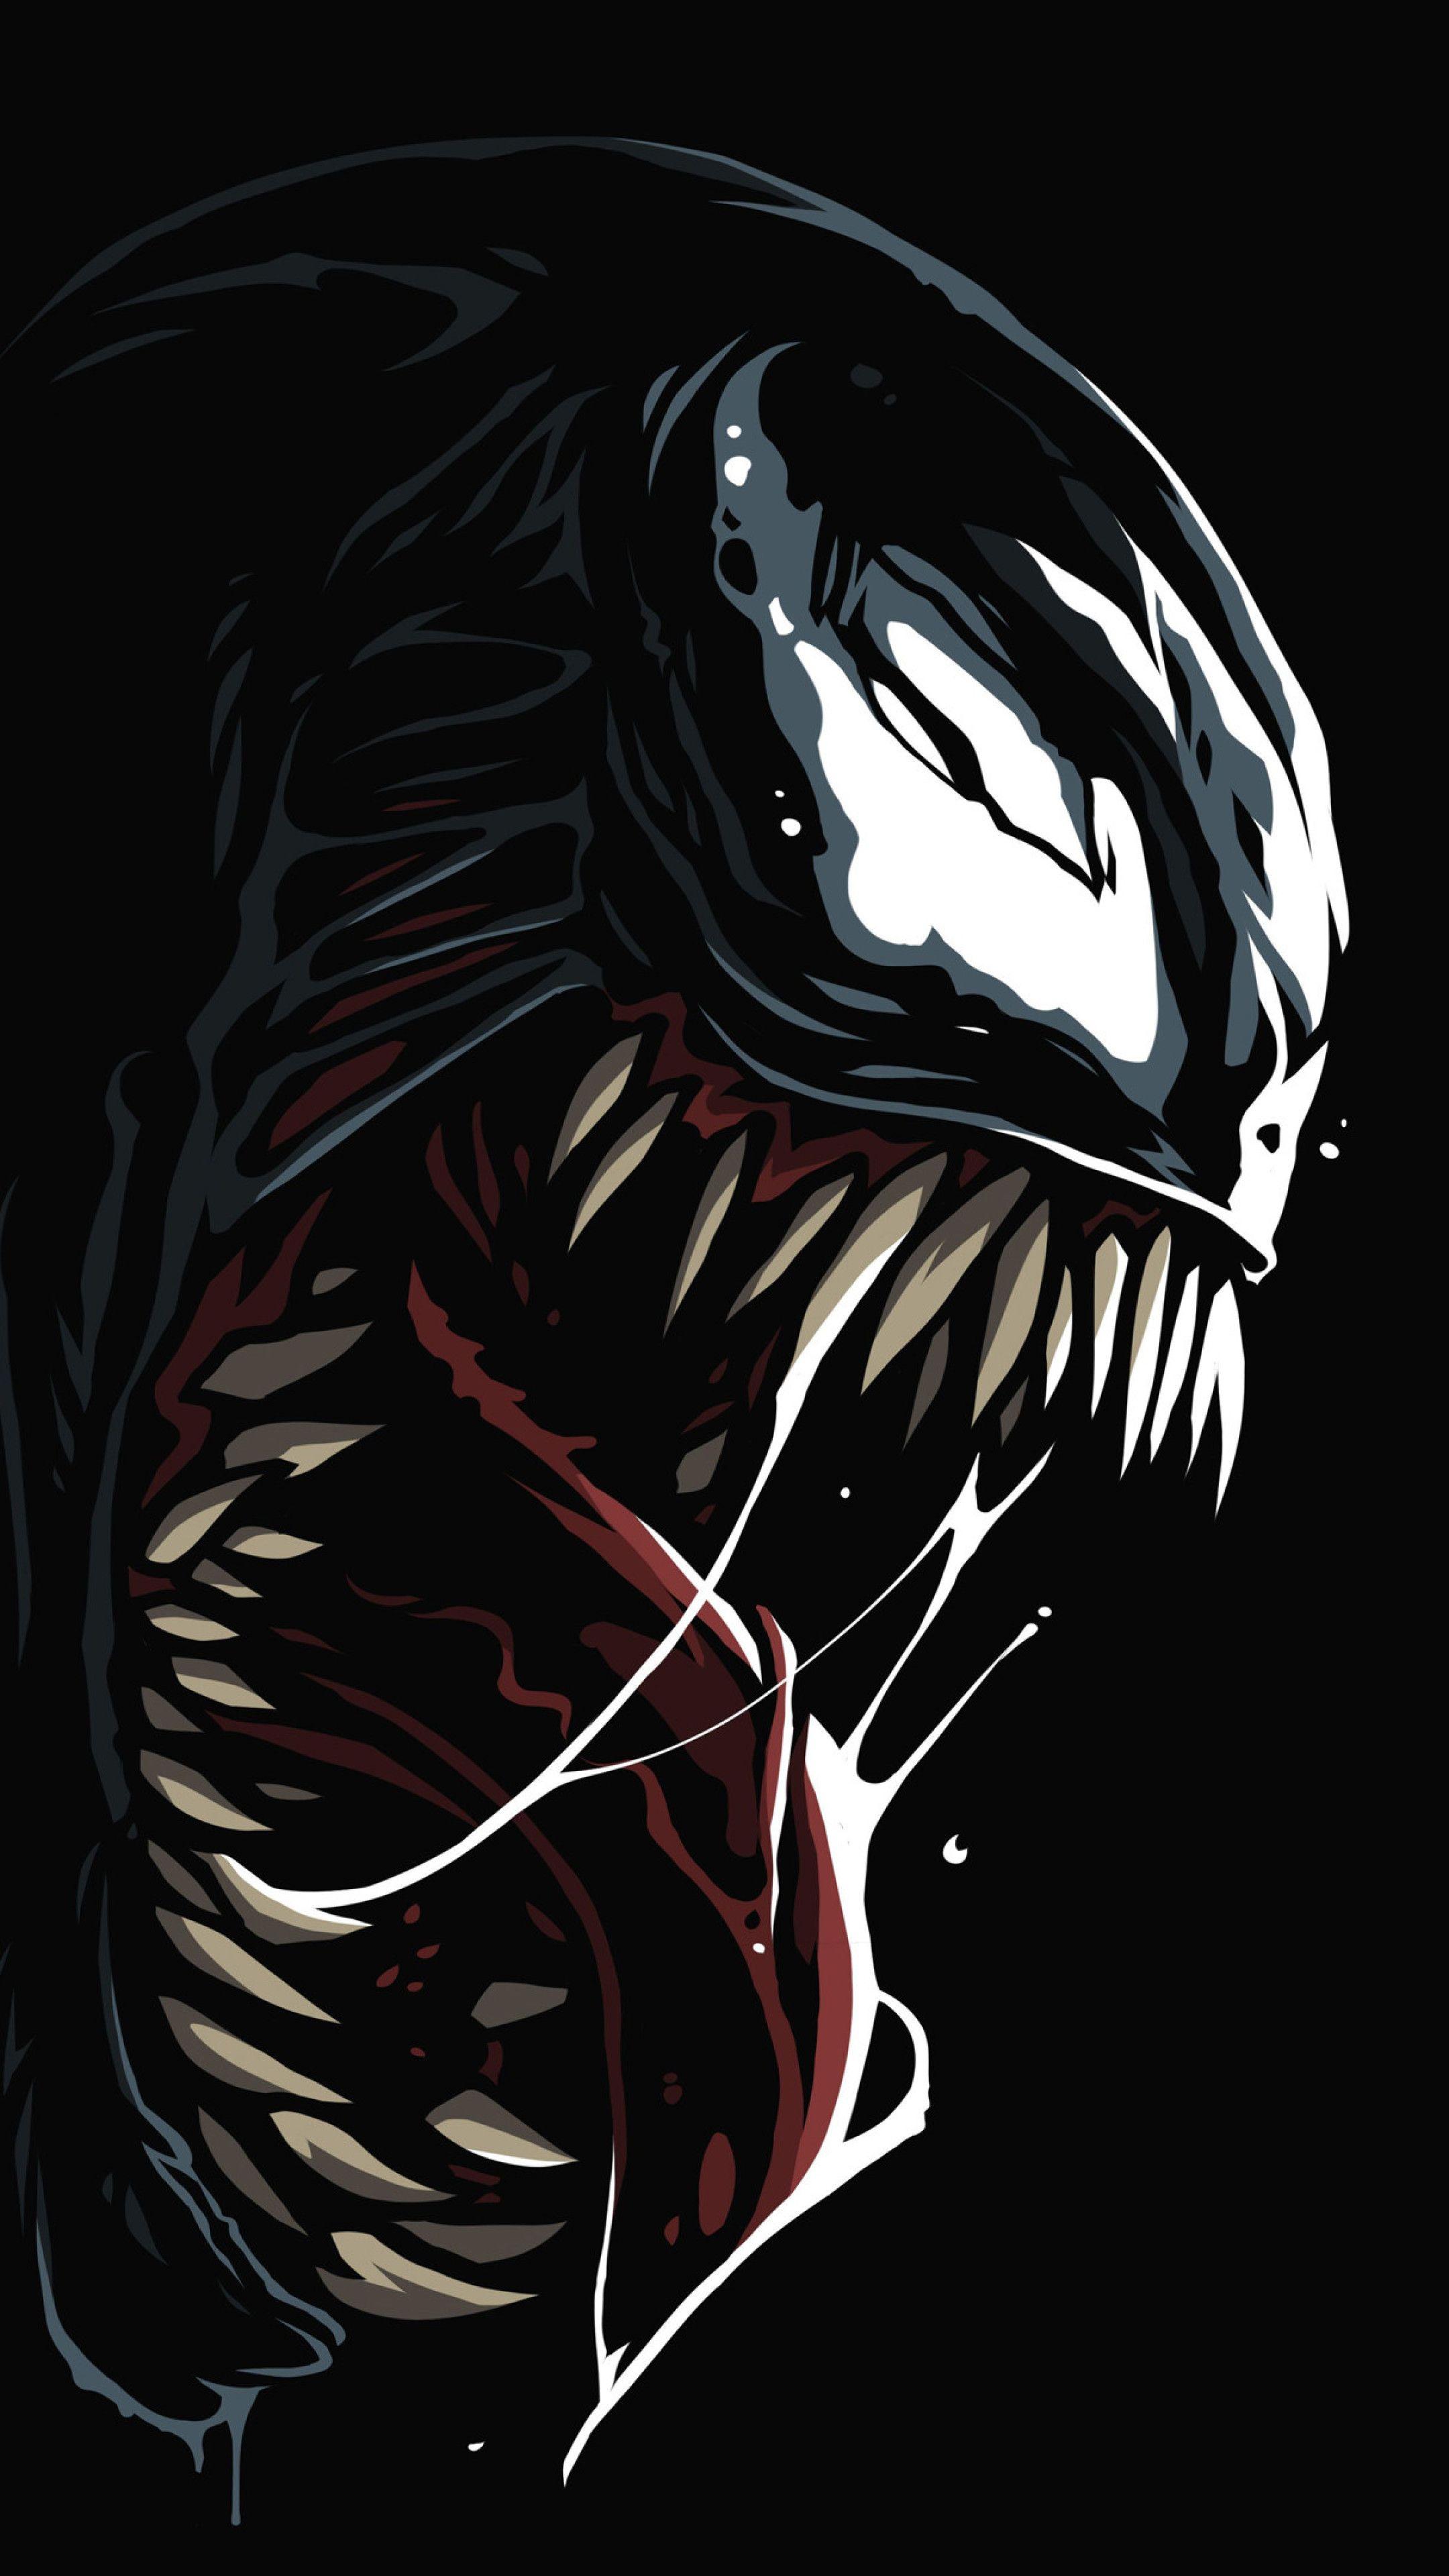 Venom Amoled 4k In 2160x3840 Resolution In 2020 Deadpool Wallpaper Hd Anime Wallpapers Marvel Wallpaper Hd